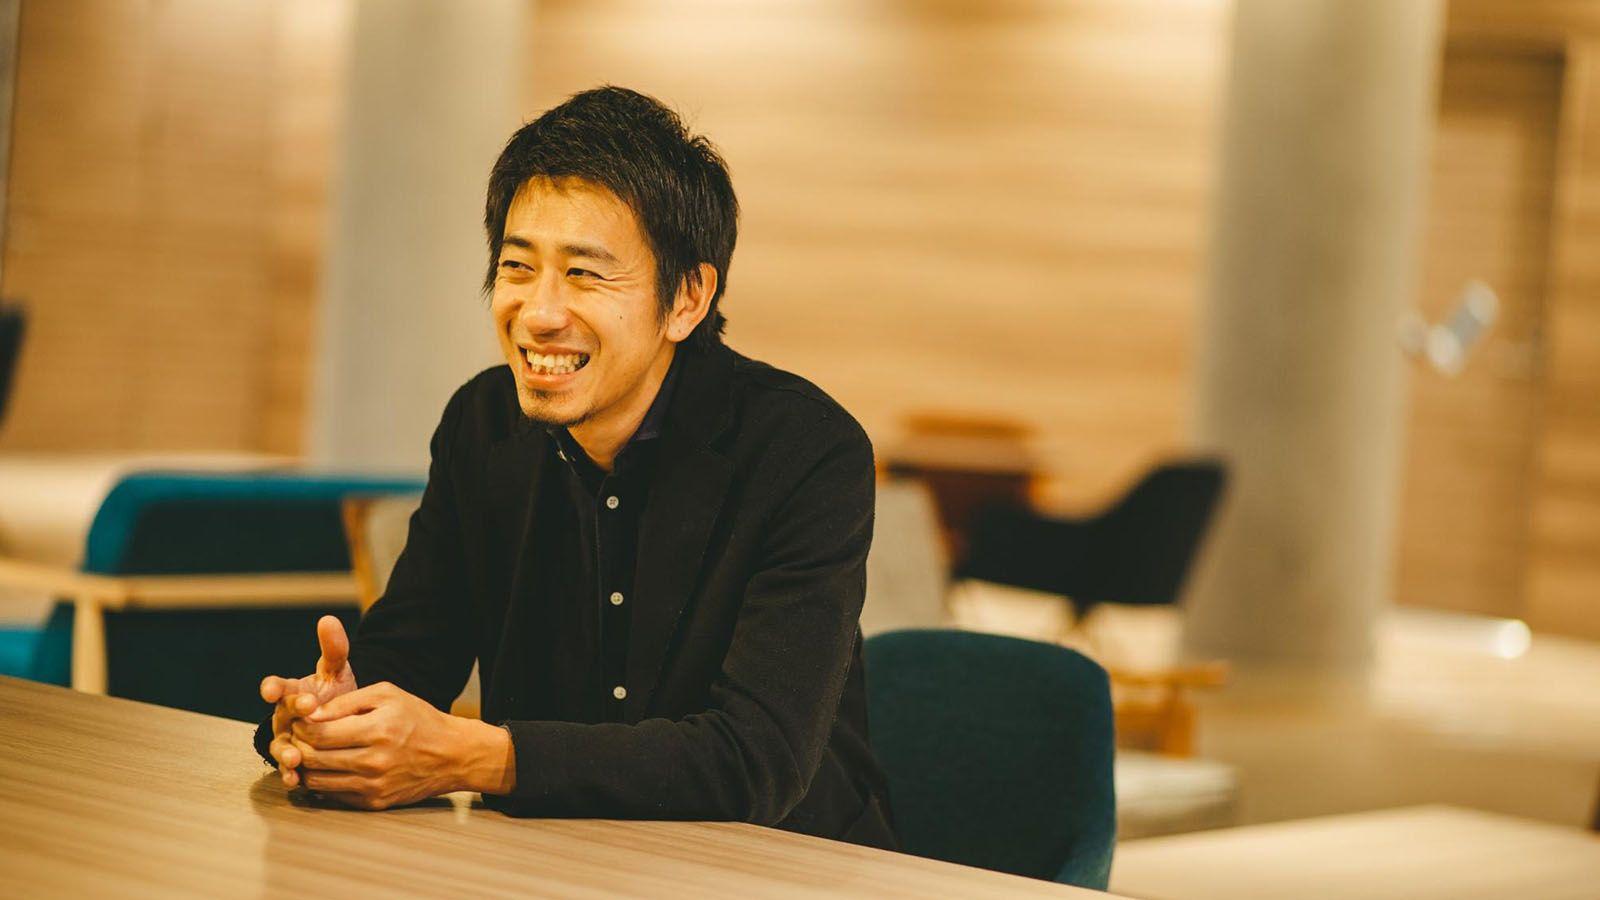 Retty、東証マザーズ上場。代表 武田和也さんと振り返る「10年」の歩み